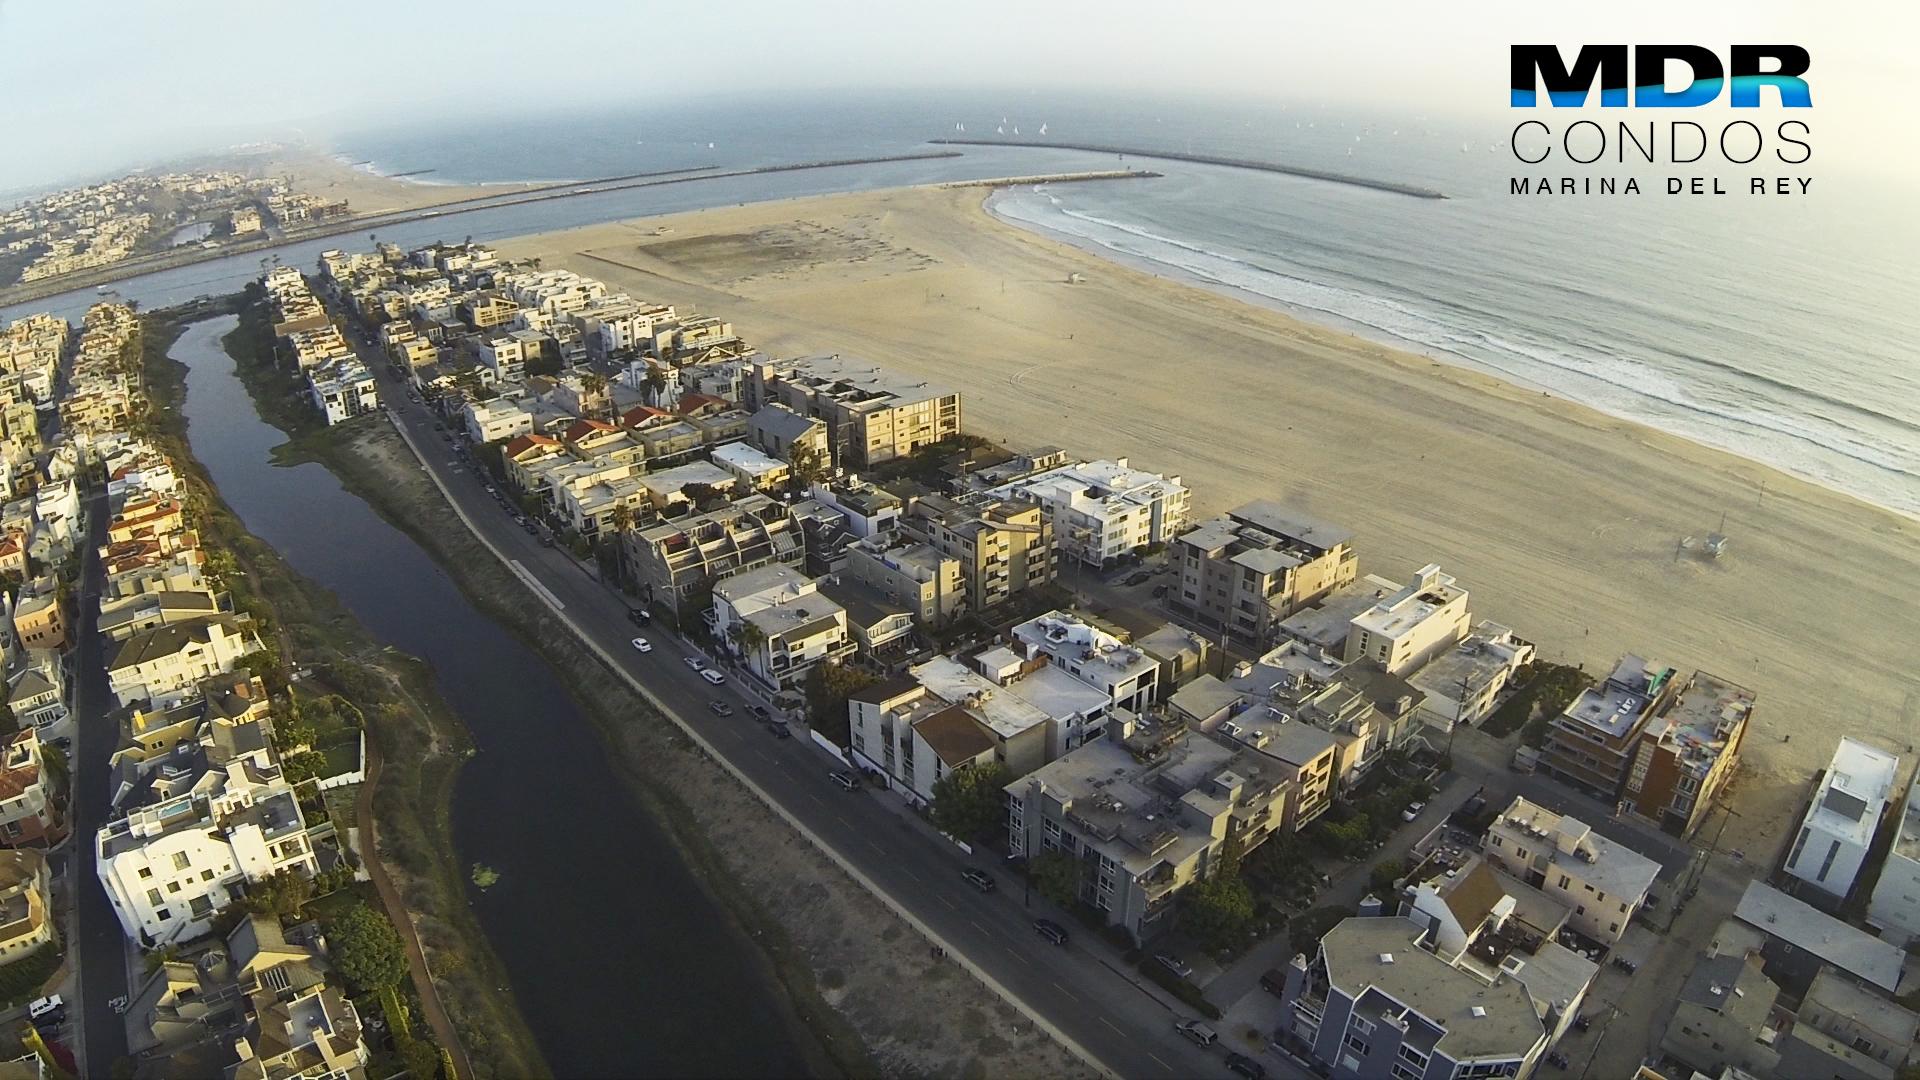 1 Spinnaker #7, Marina del Rey – Insane Ocean Front Condo on the Peninsula